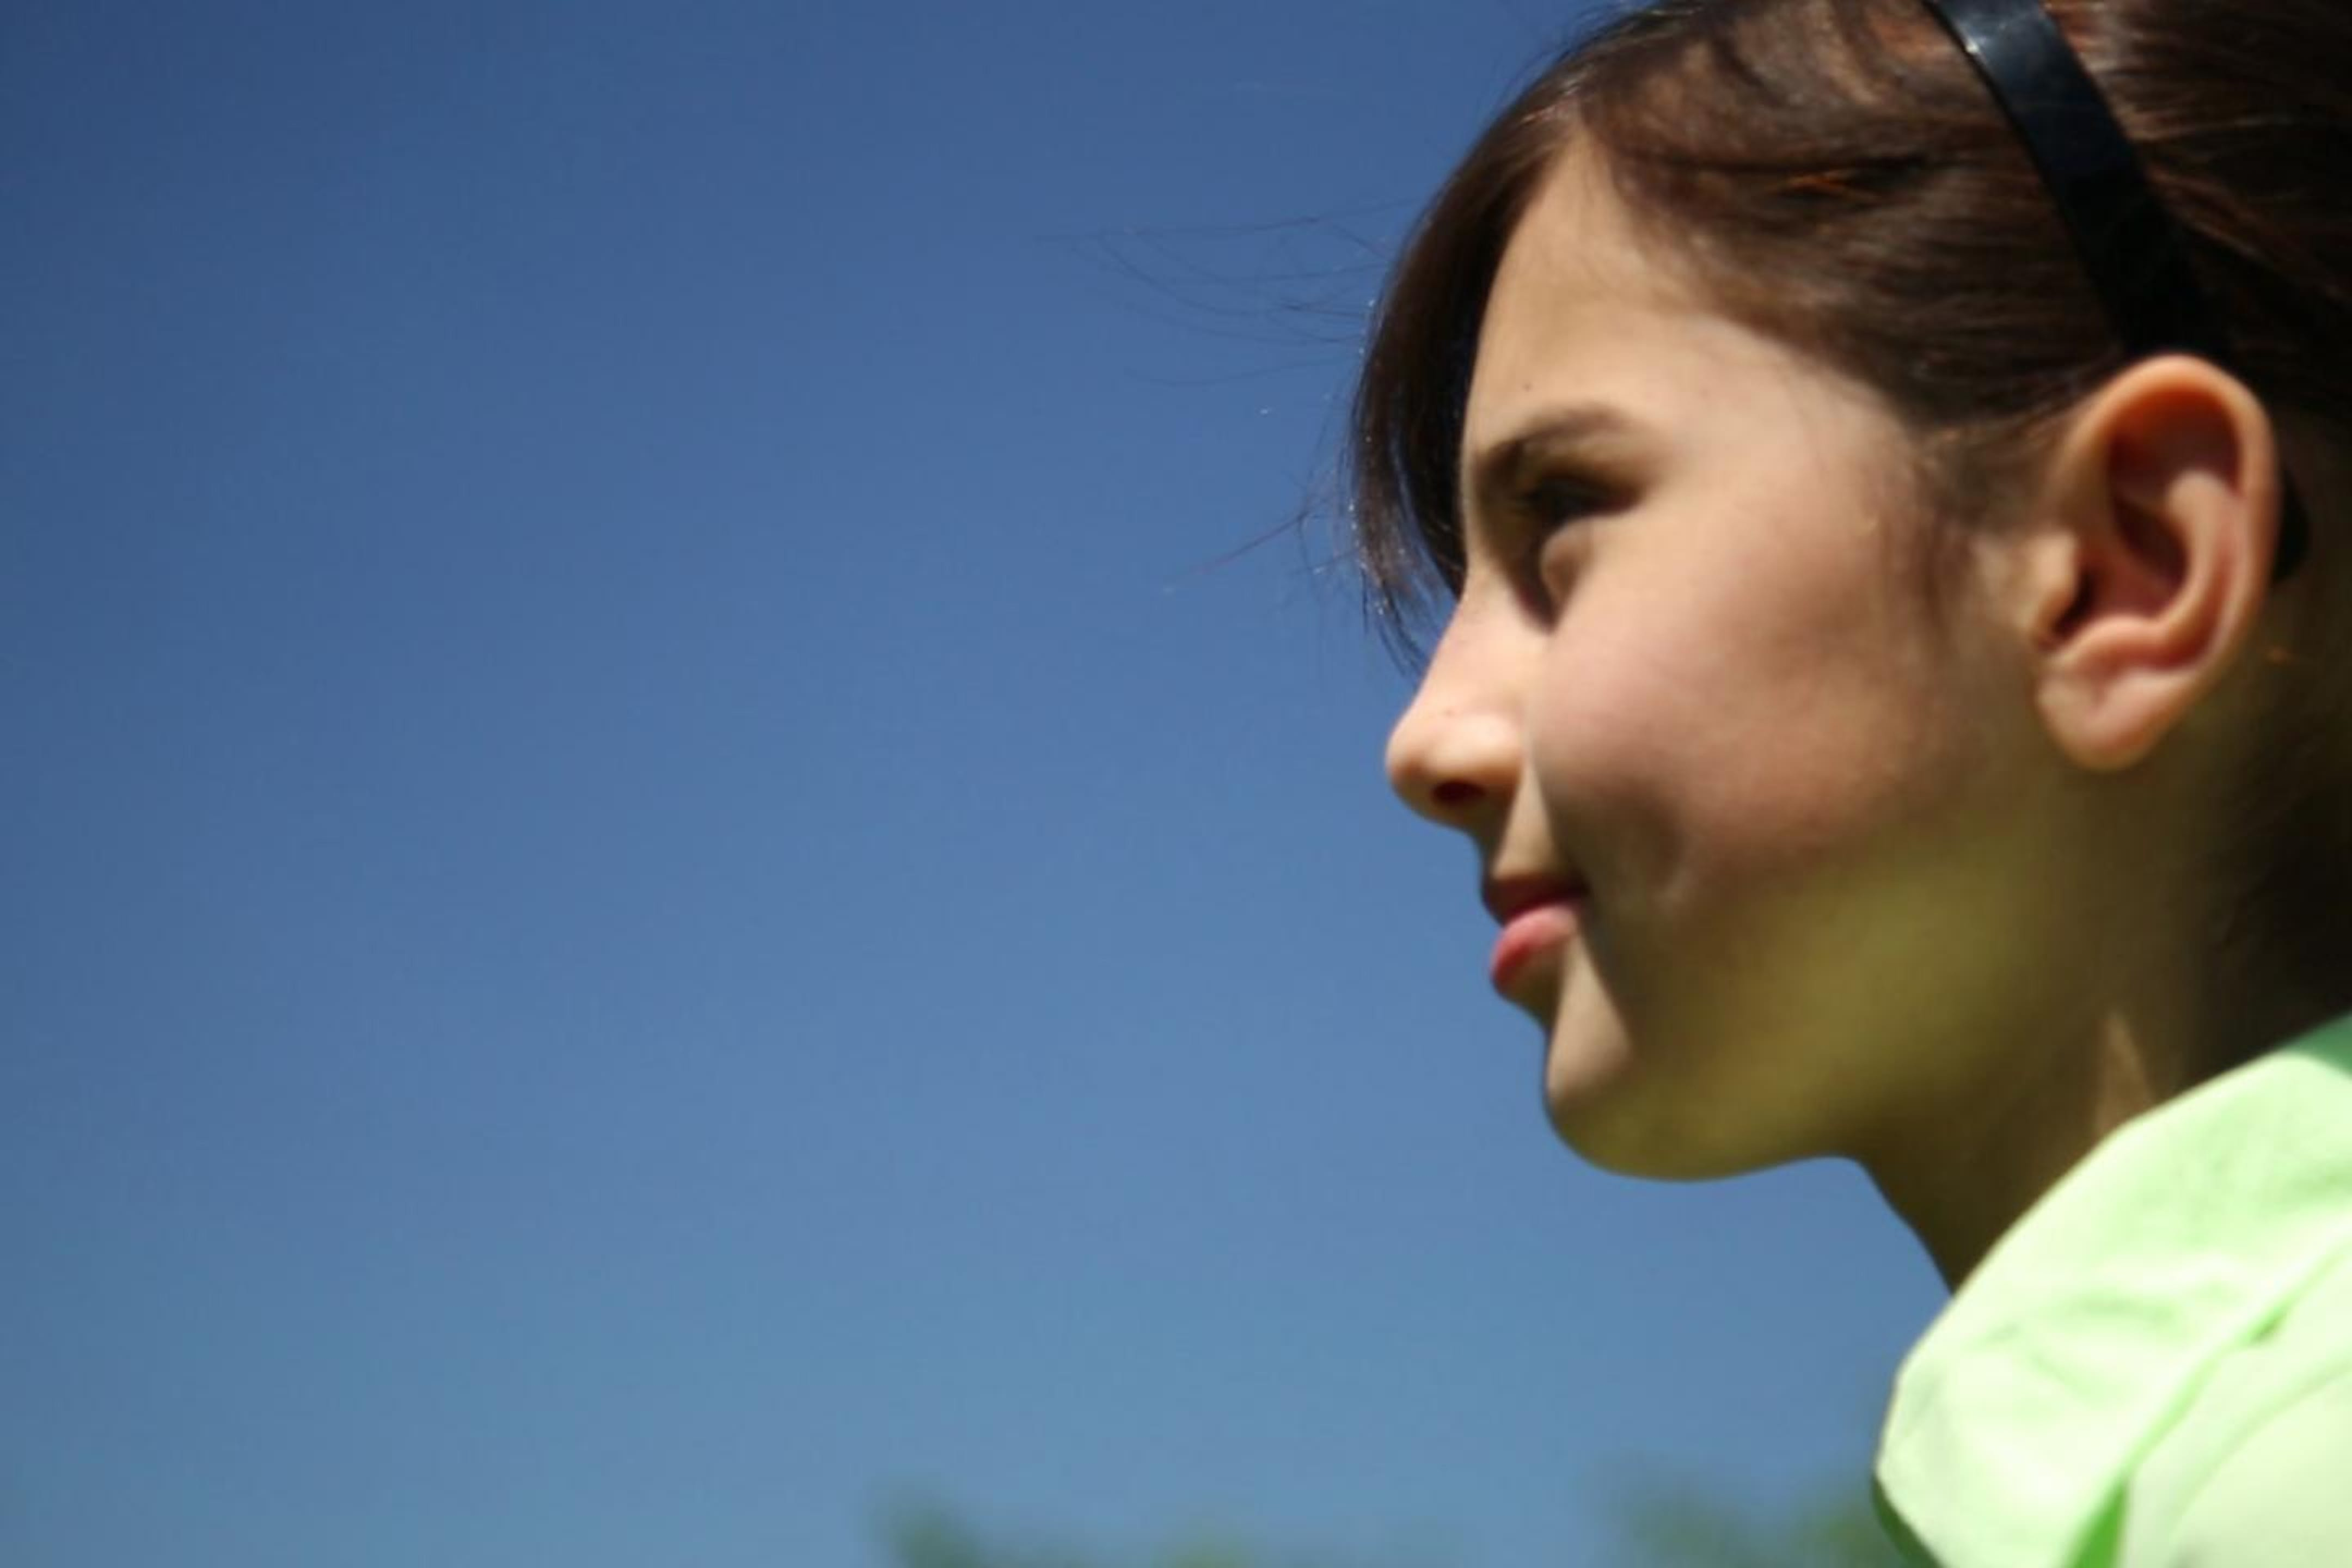 Sana, 10 anni, è una rifugiata afghana